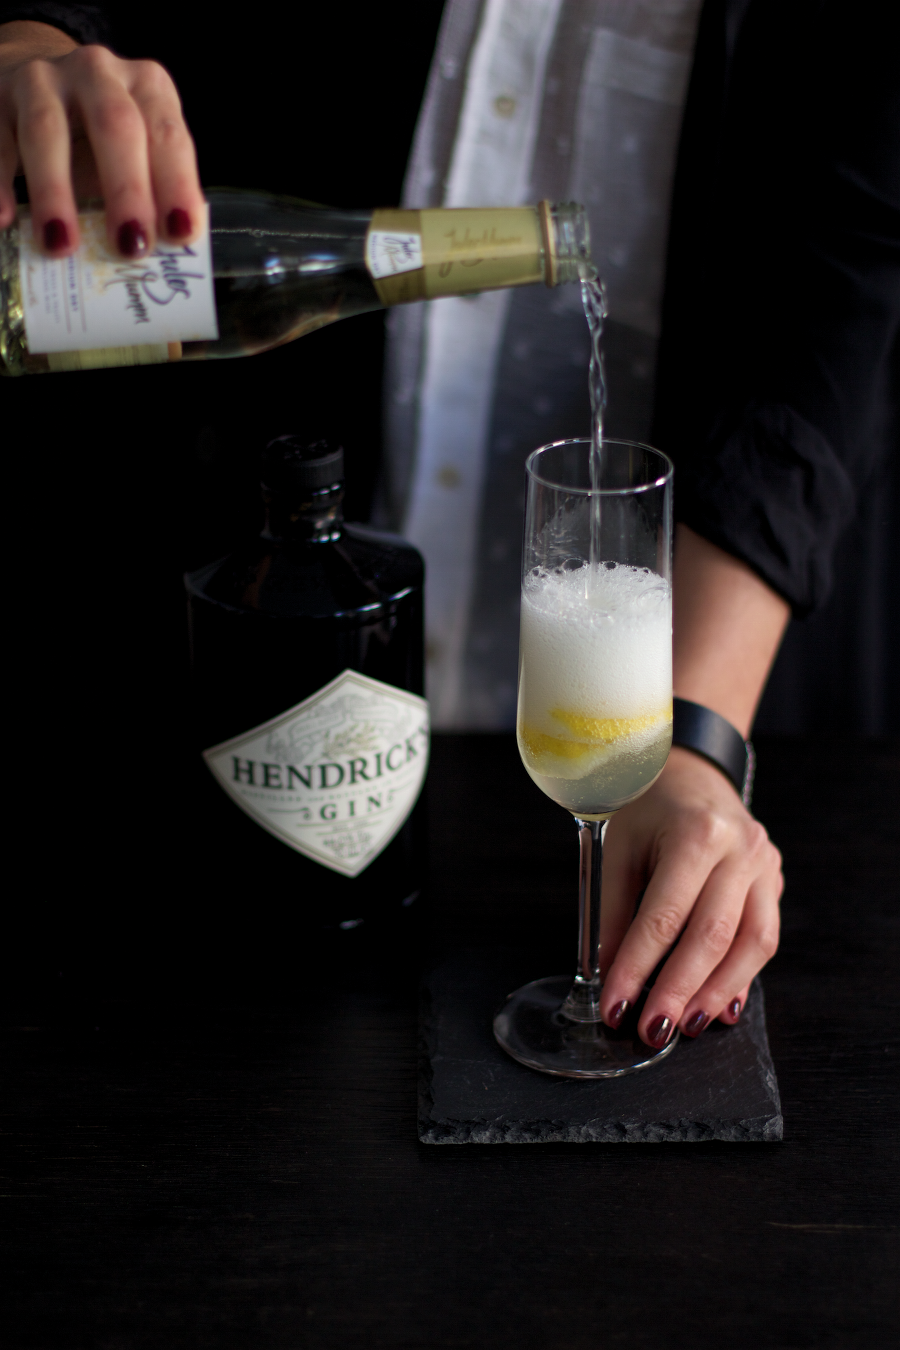 French 75 Champagne Hendricks Gin Cocktail